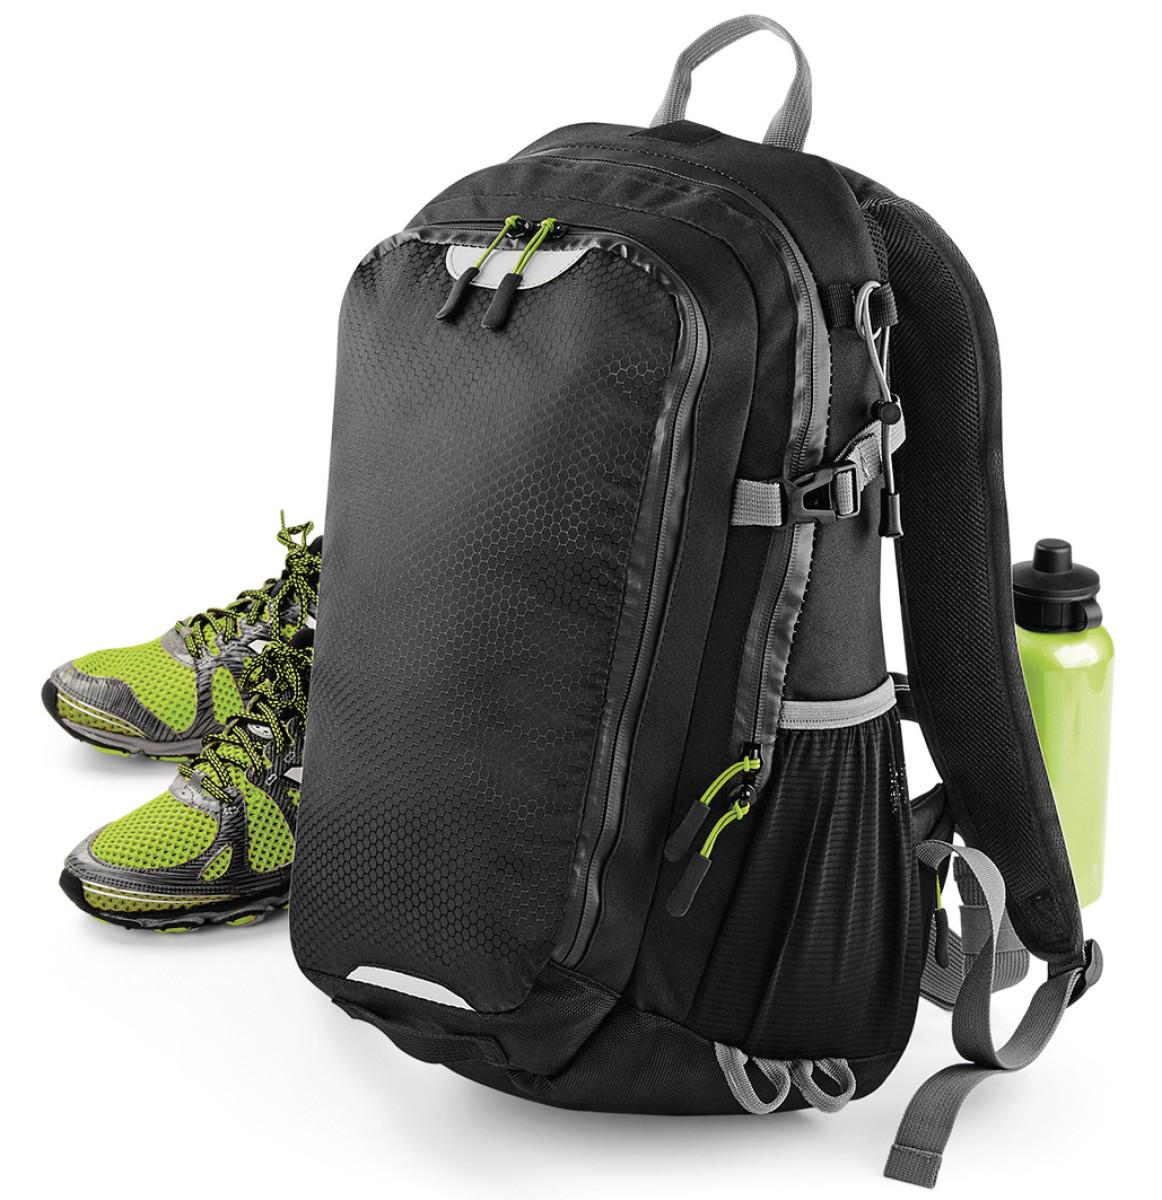 Quadra Apex 20 Litre Daypack